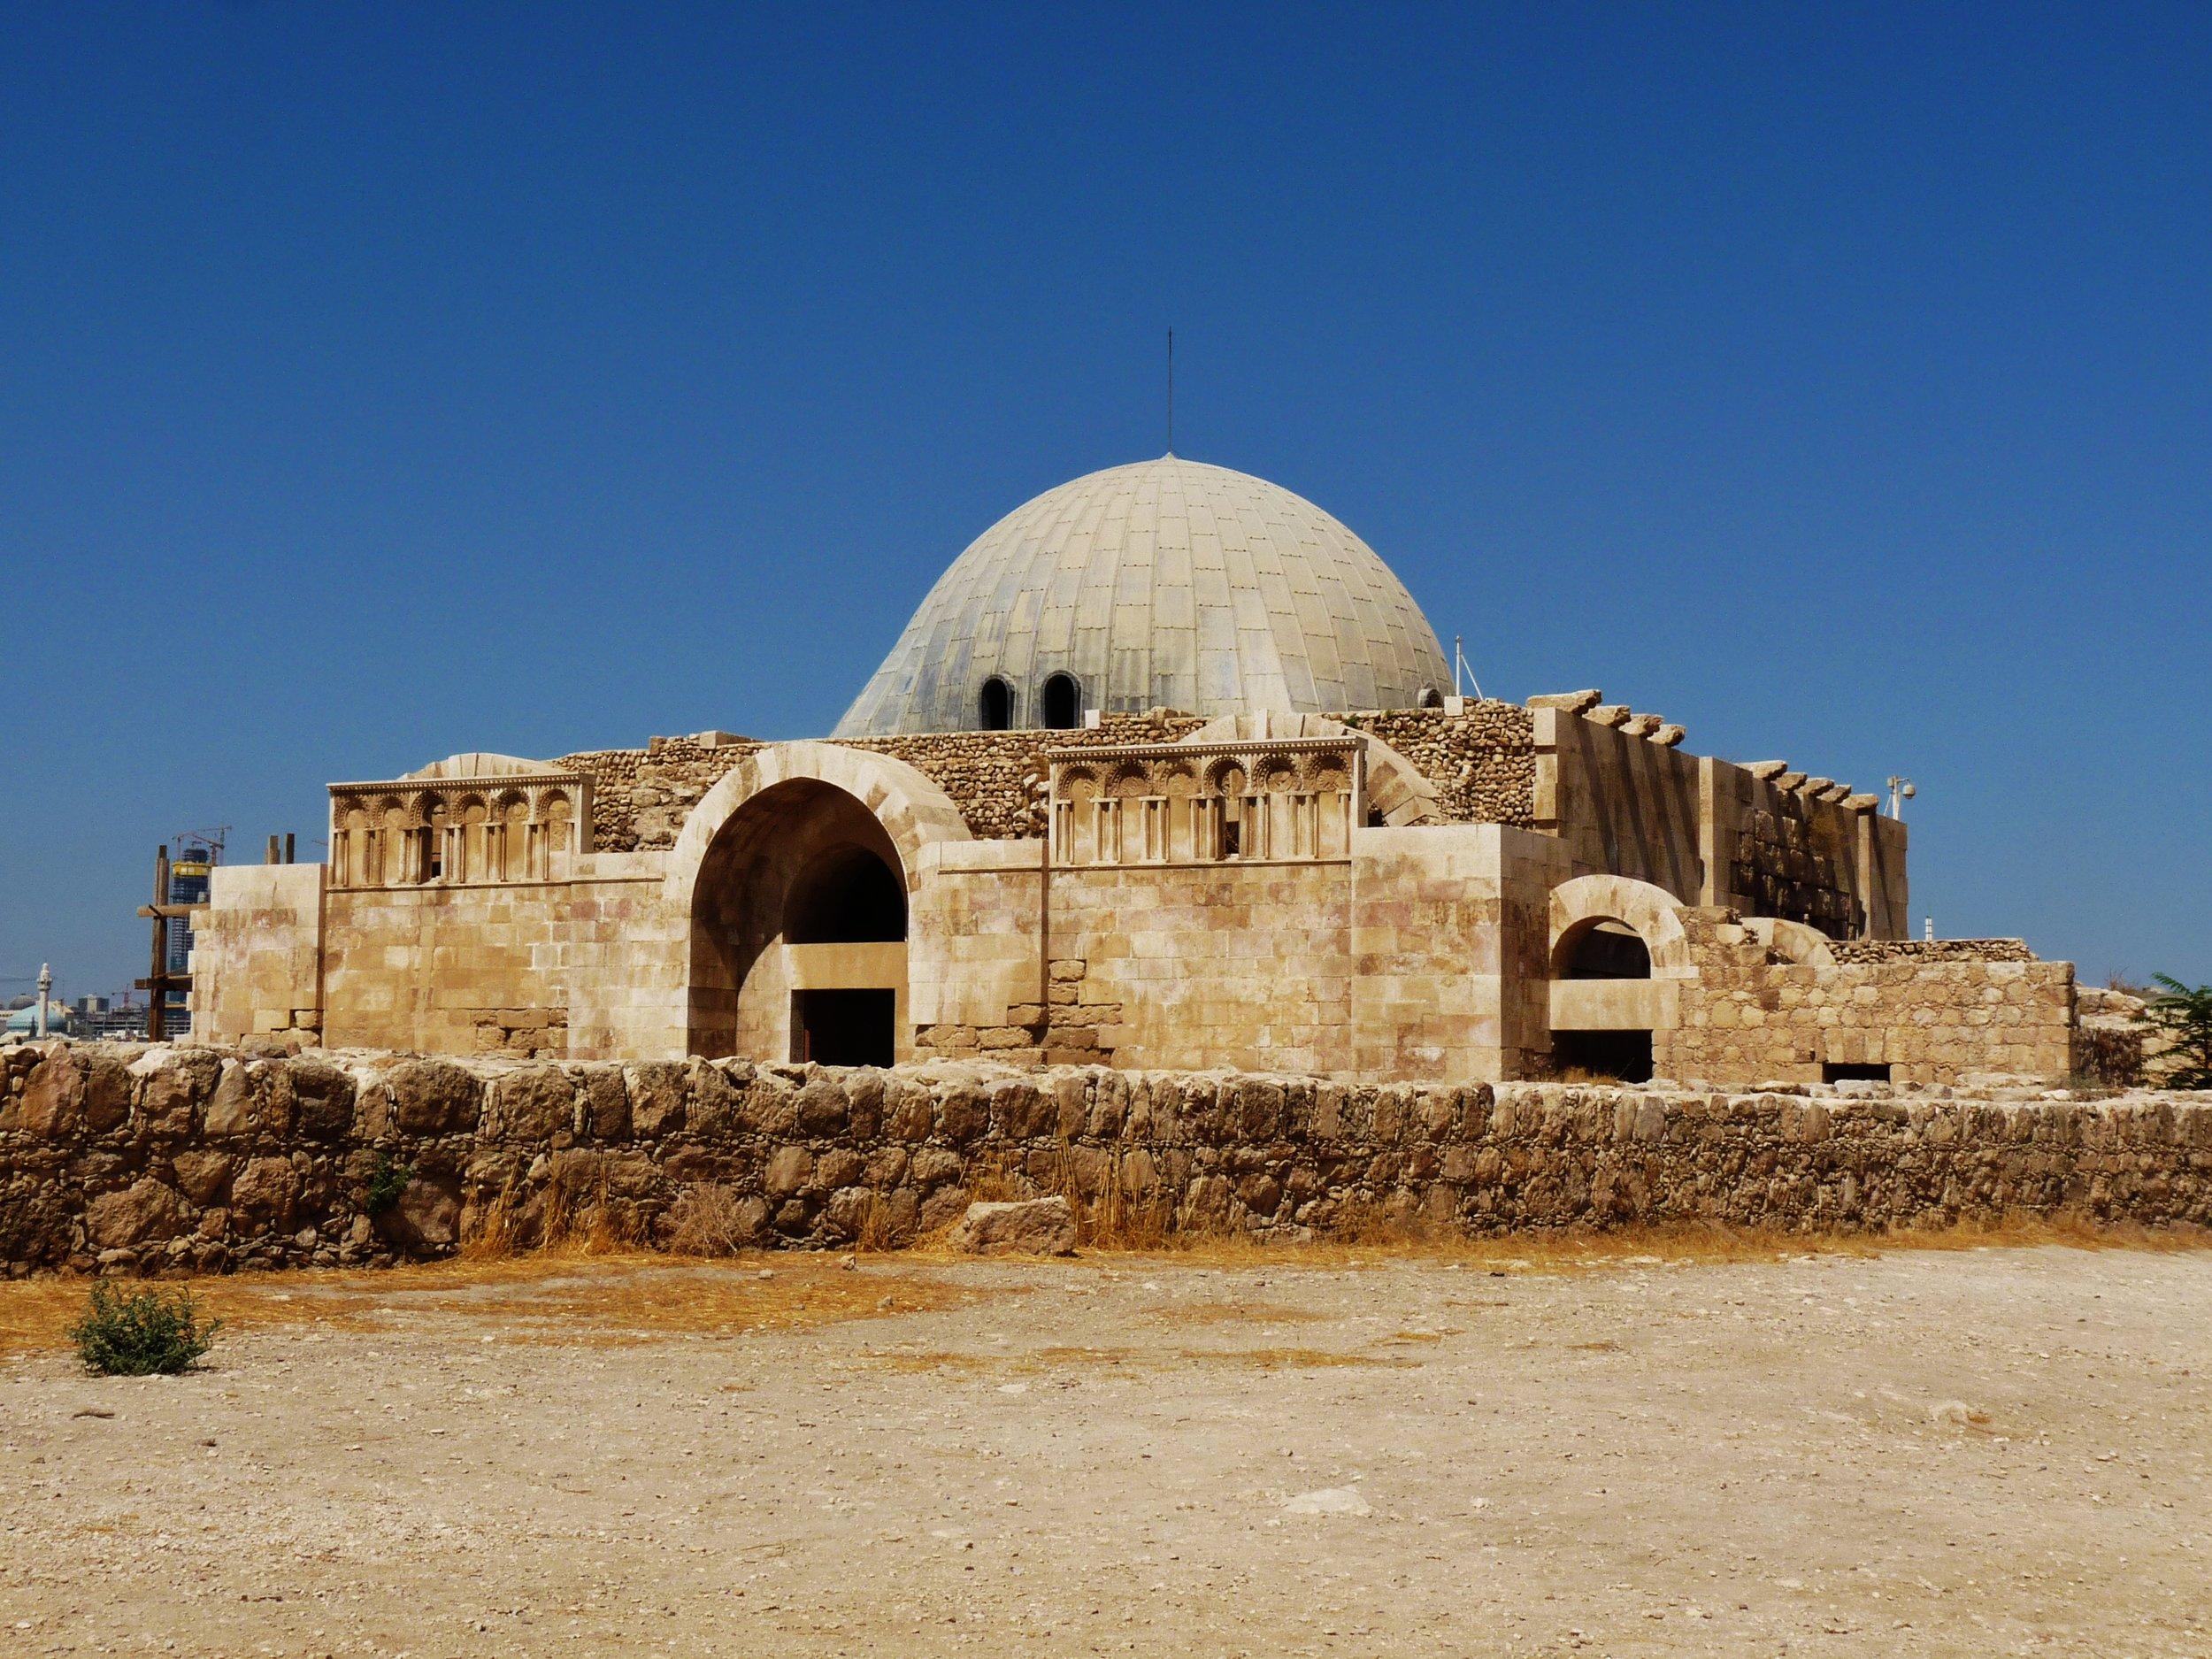 The Weekly Getaway: eating my way through Amman